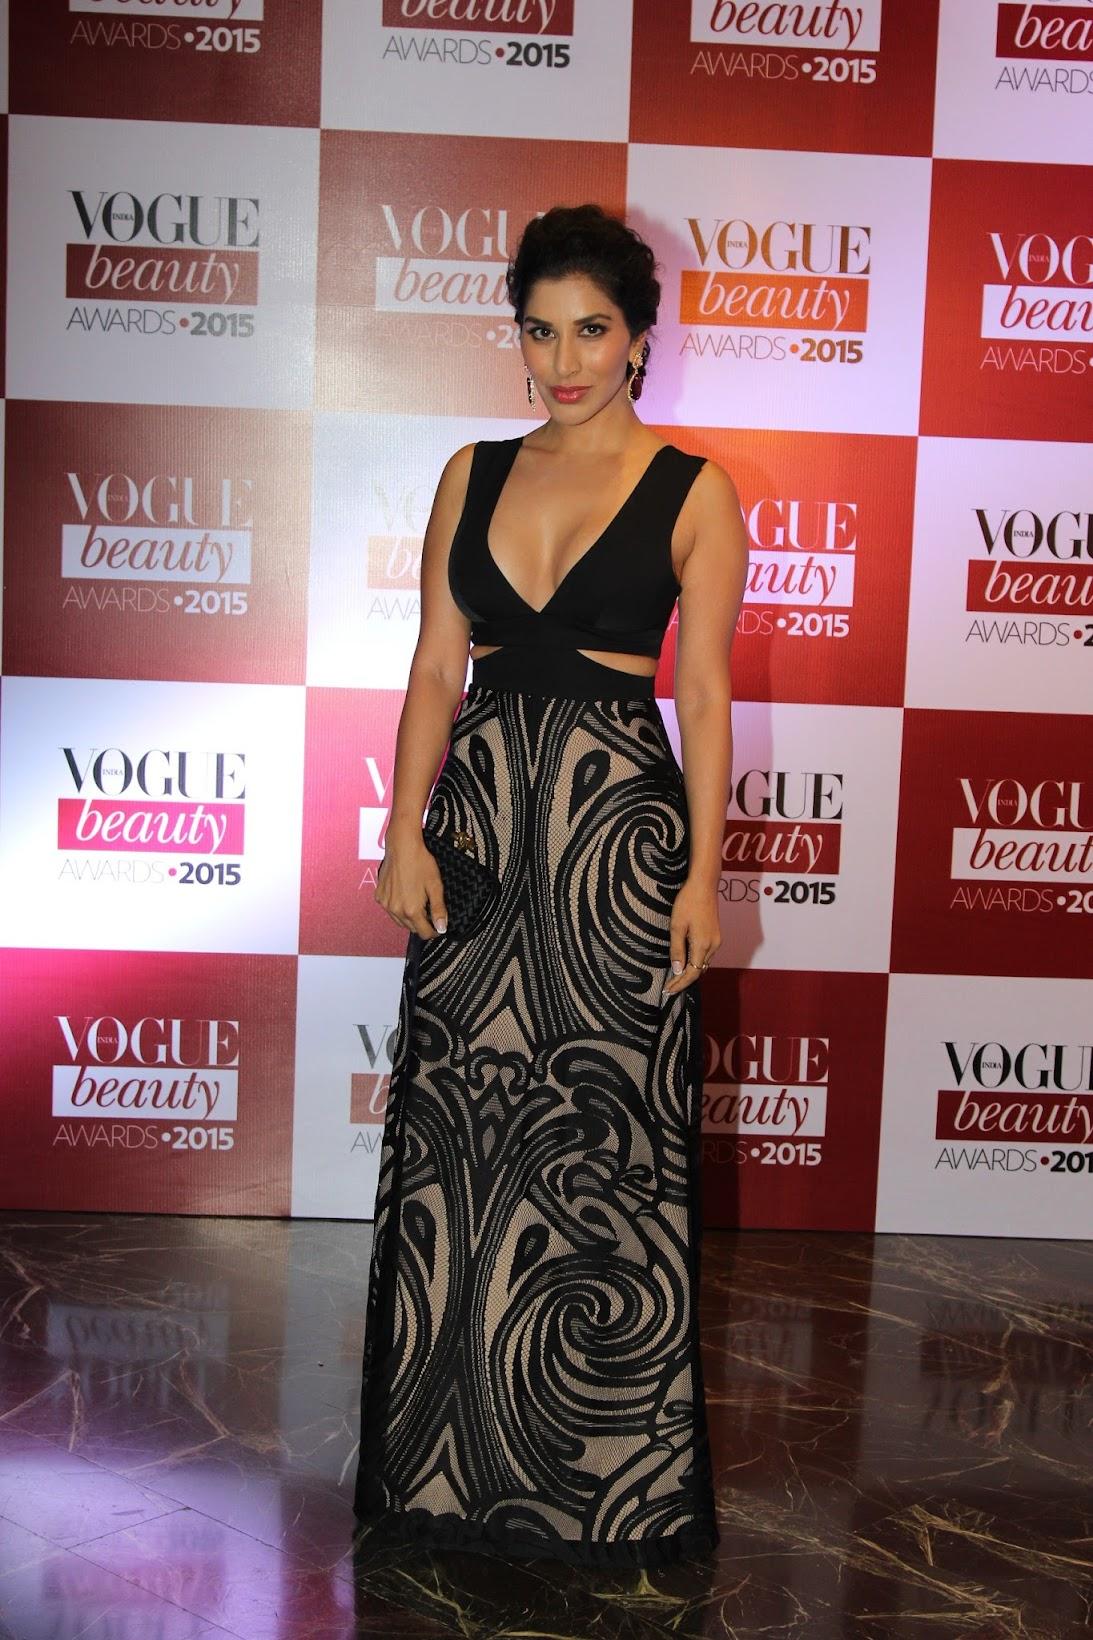 Best of Vogue India Beauty Awards 2015, Fawad Khan at the Vogue India Beauty awards